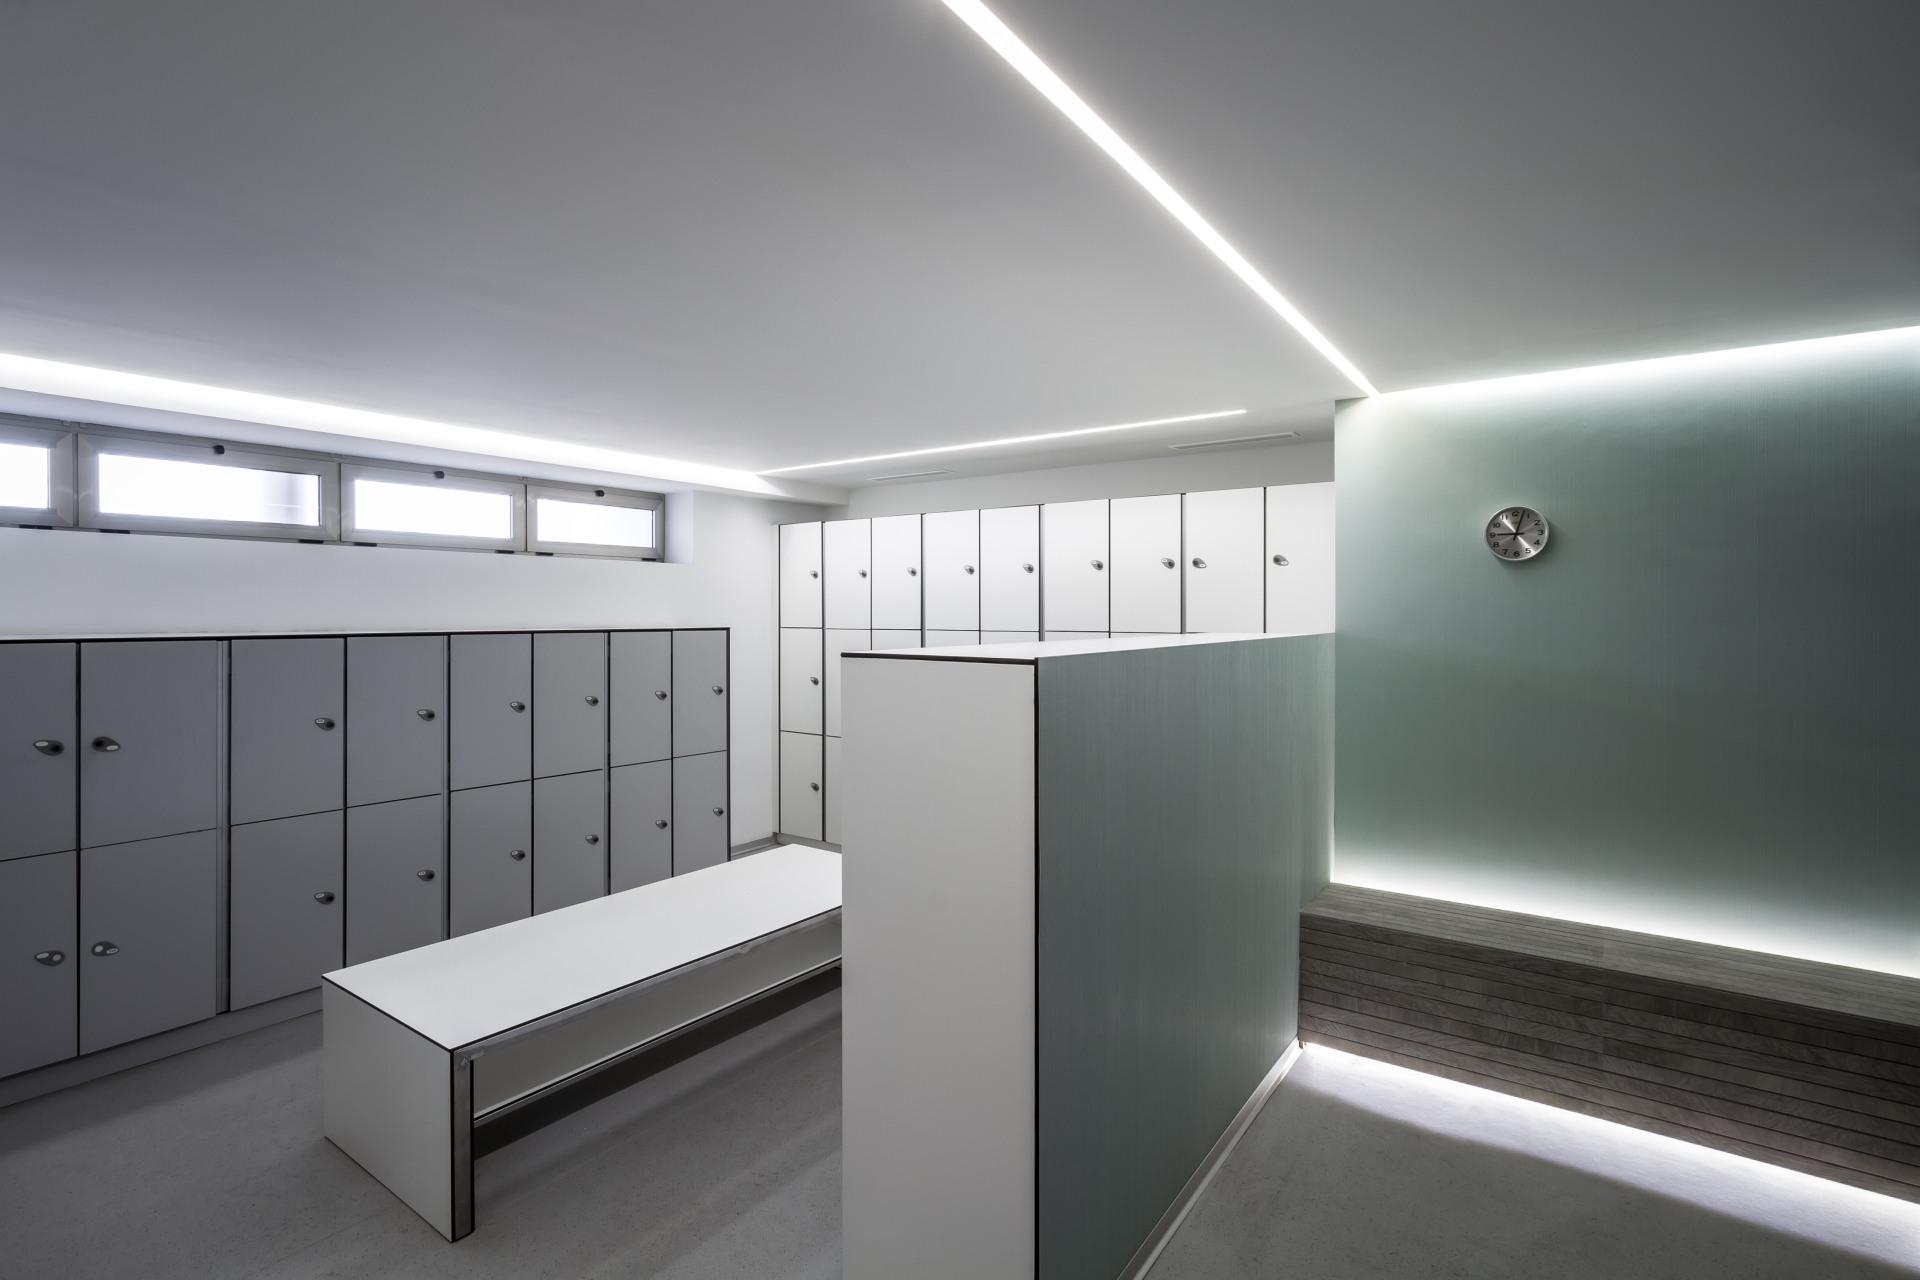 fotografia-arquitectura-valencia-german-cabo-bfm-edificatoria-club-tenis (10)